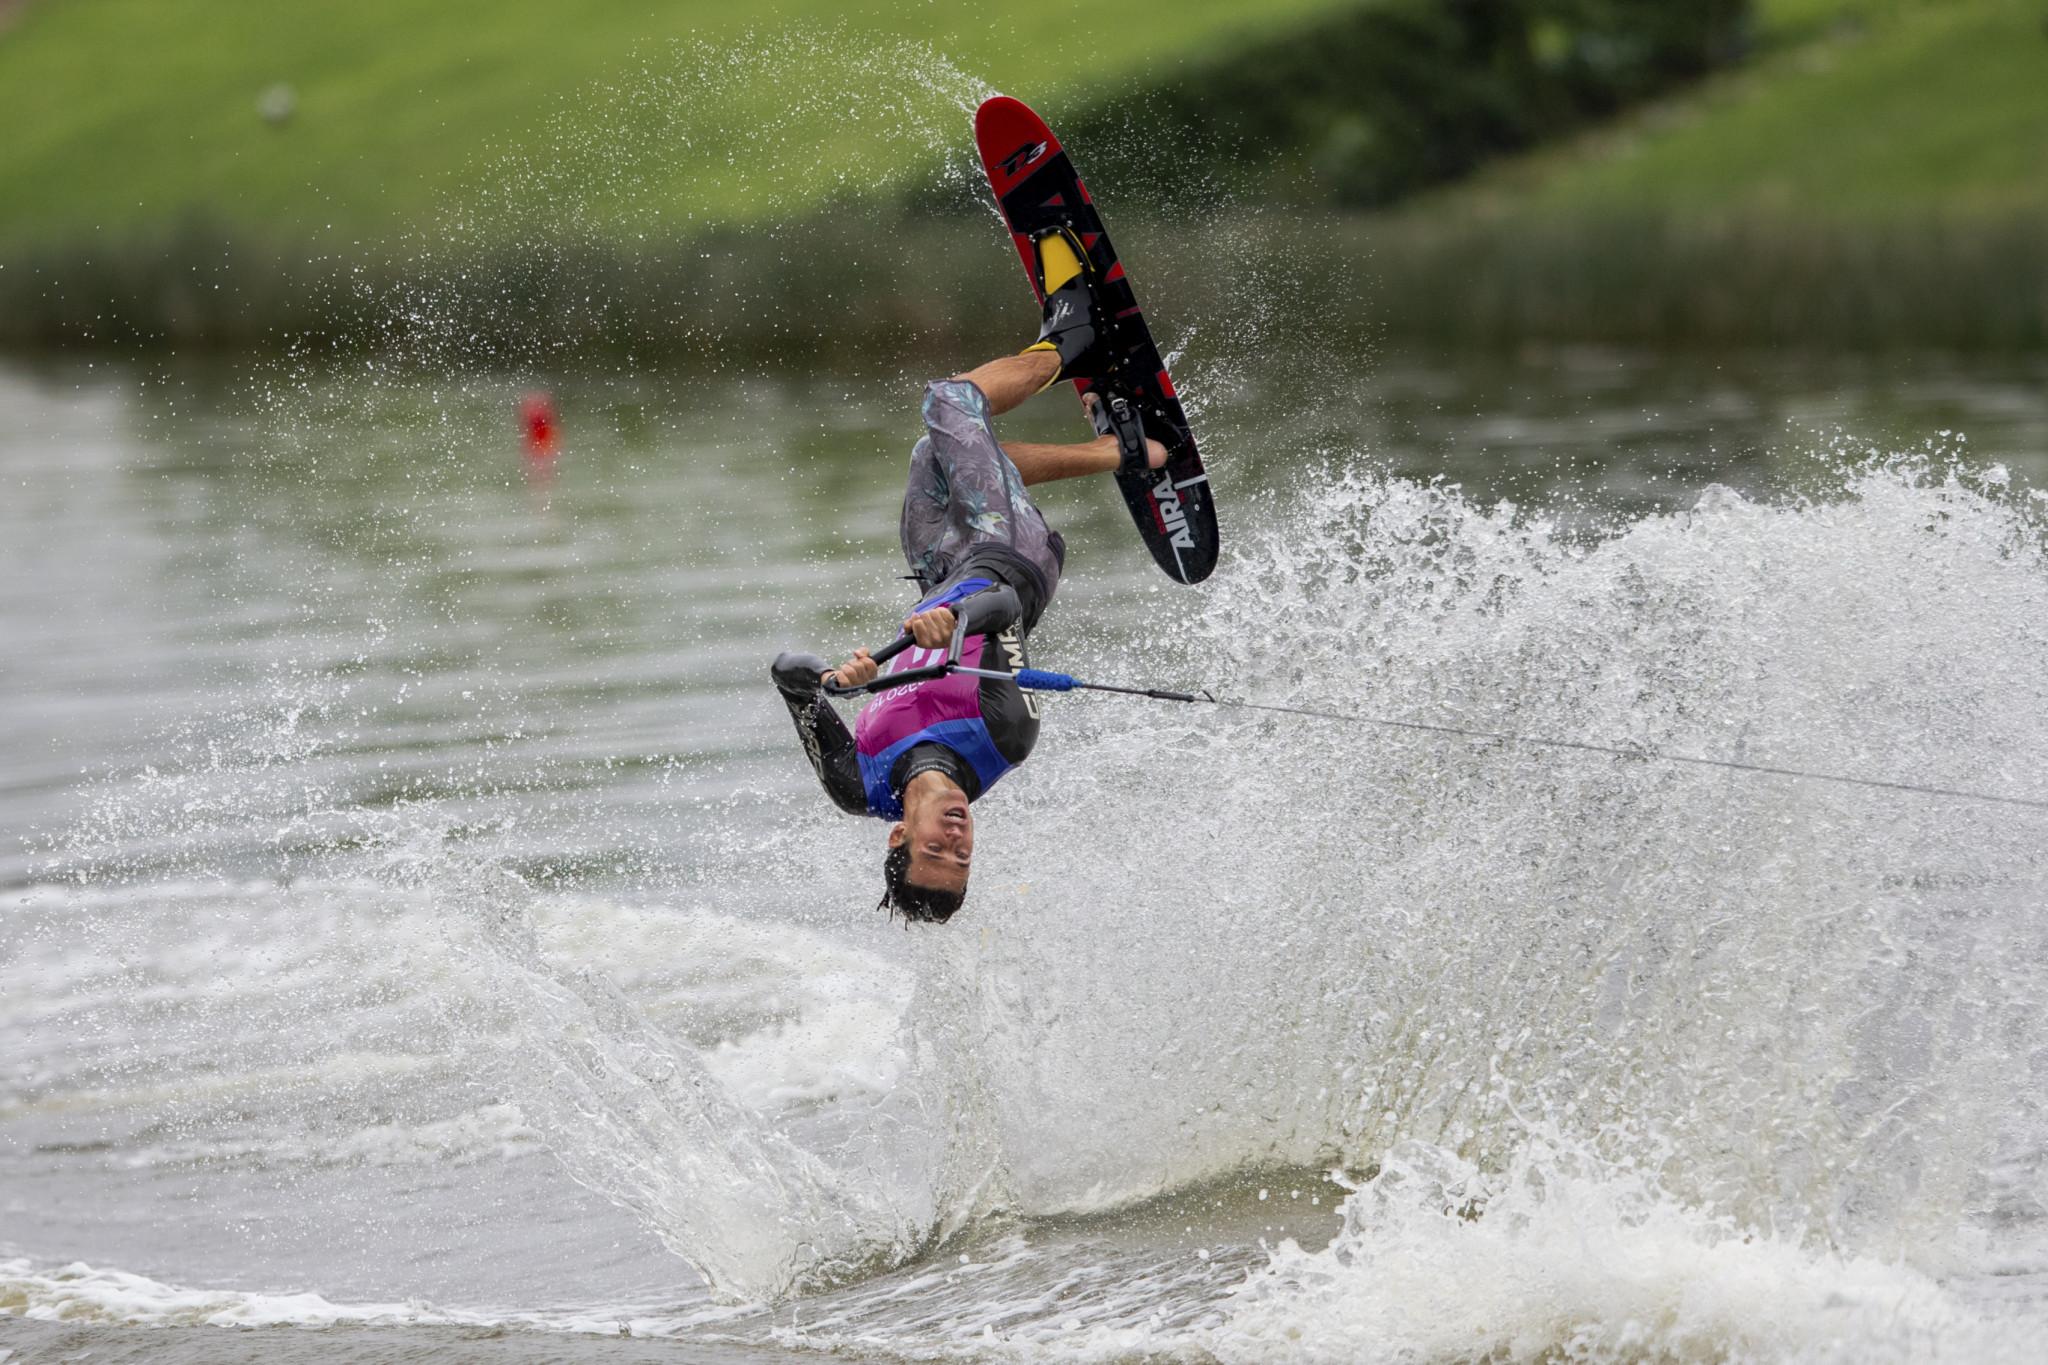 Water-ski makes a splash at Lima 2019